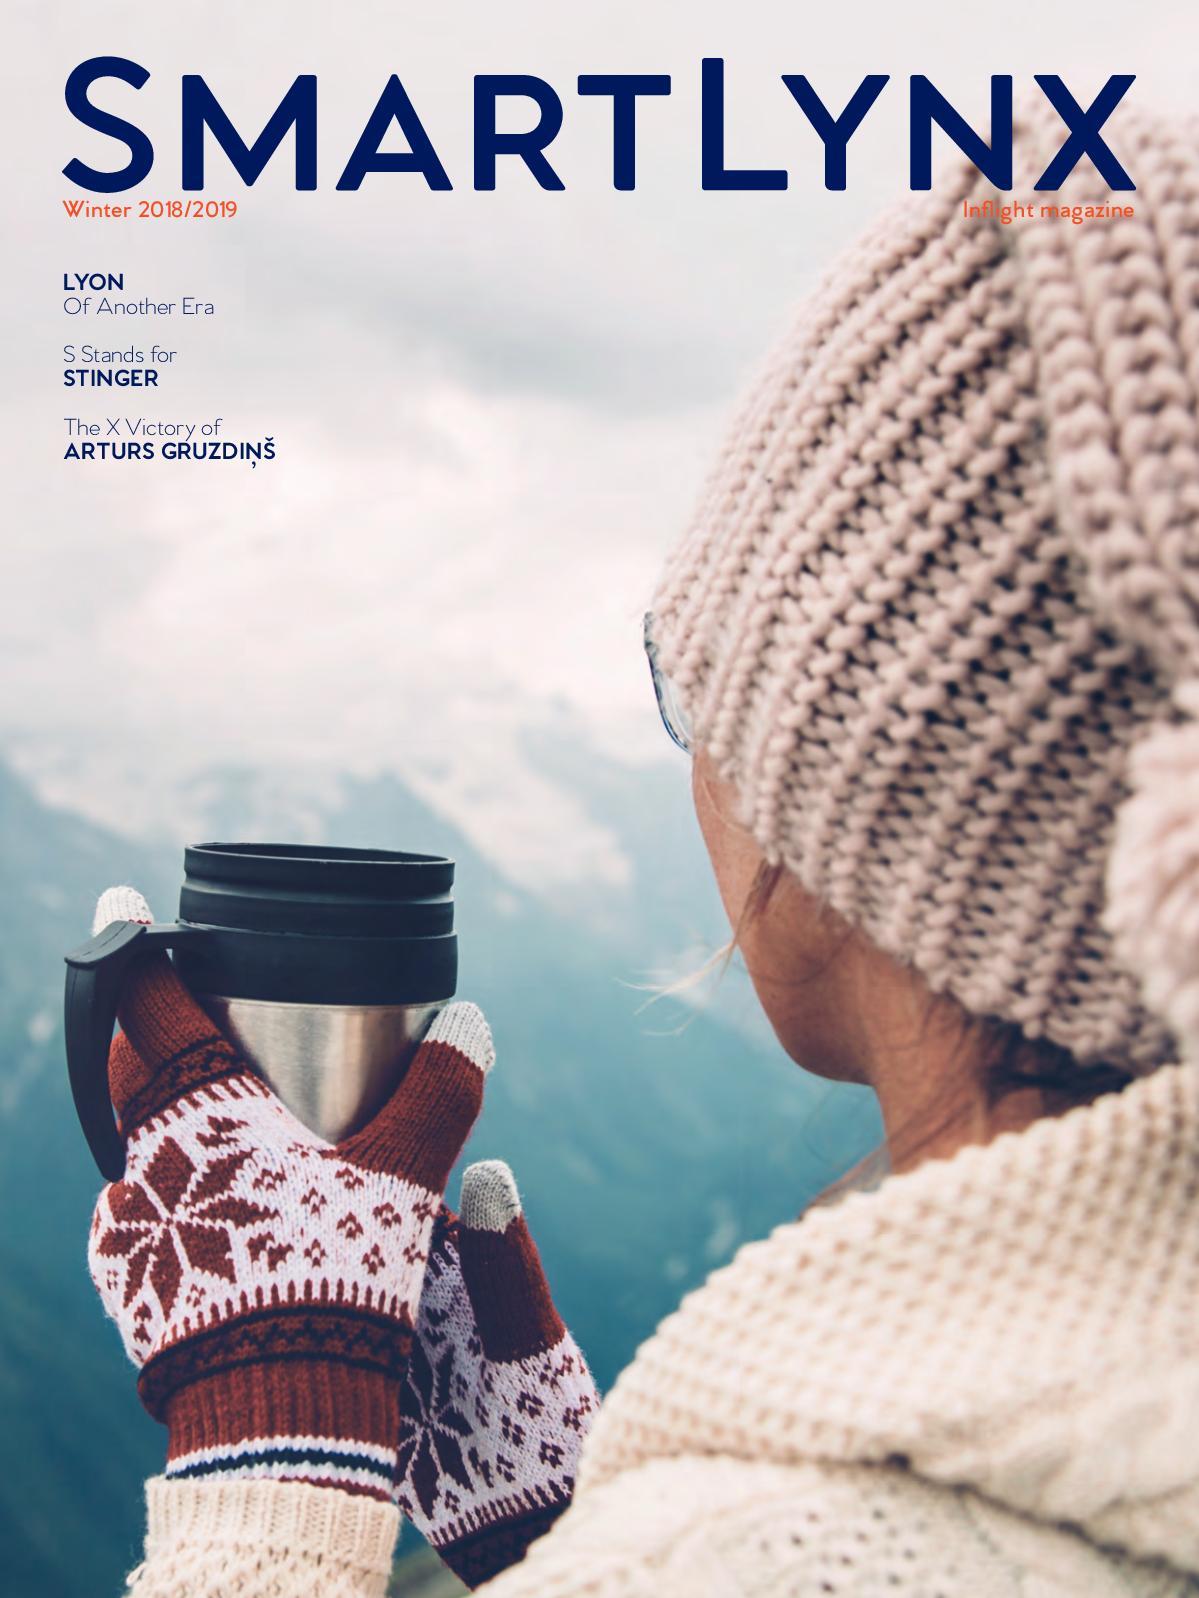 a4ffcb0d550 Calaméo - SmartLynx in-flight magazine Winter 2018 2019